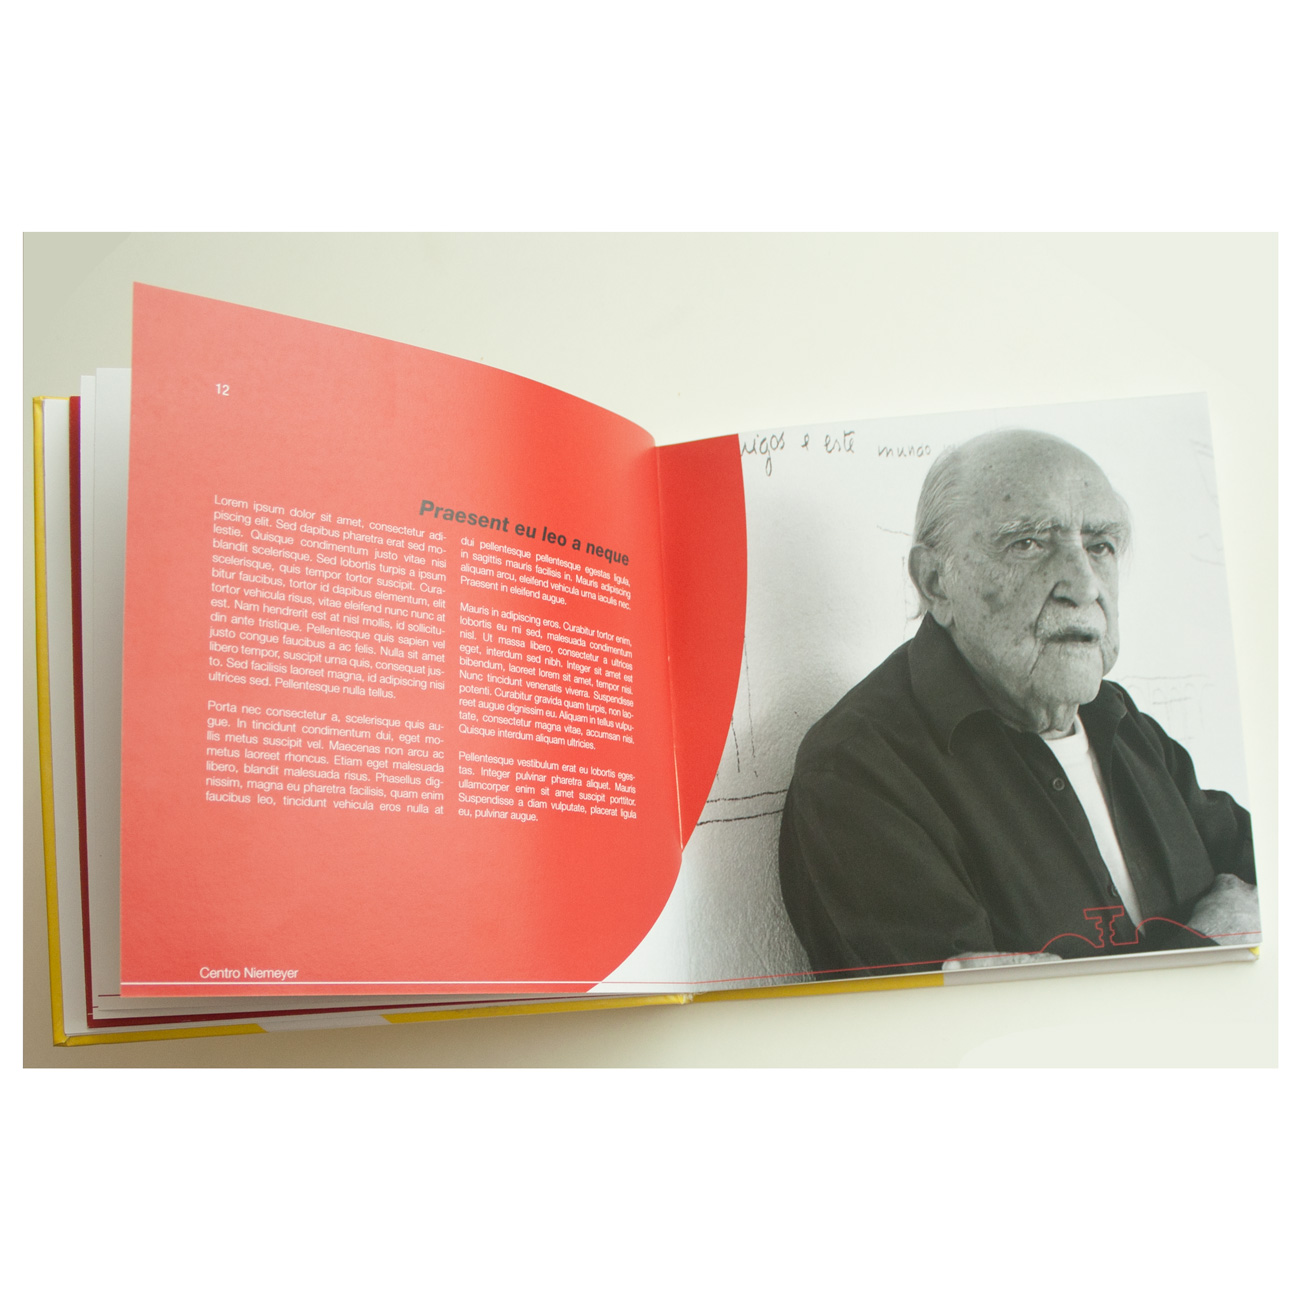 diseño editorial de catalogo de oscar niemeyer